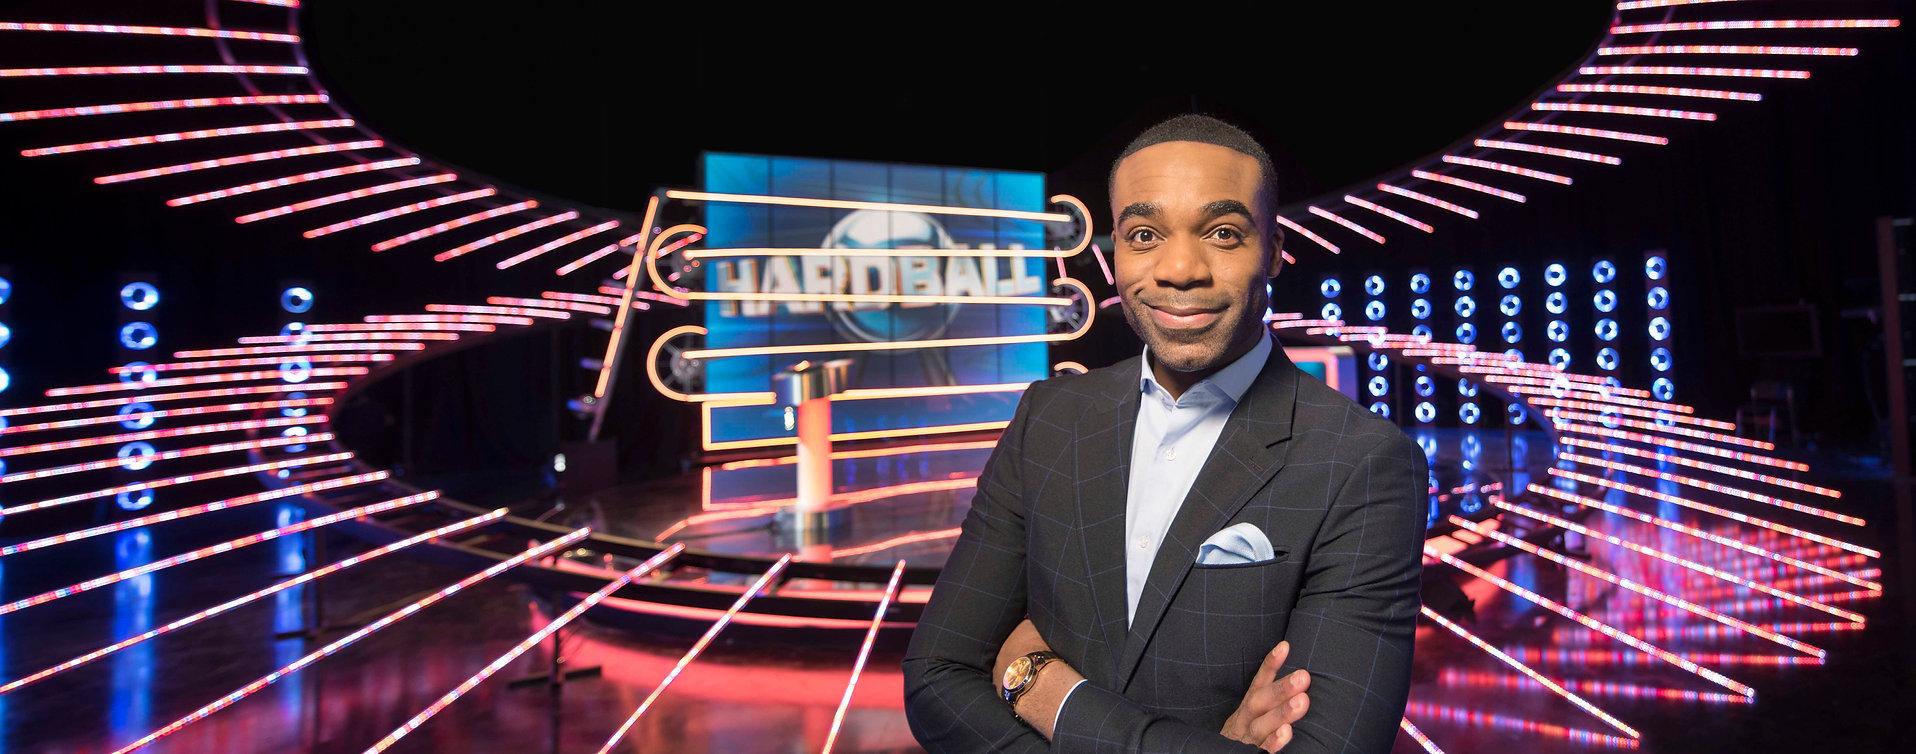 Hardball tv show